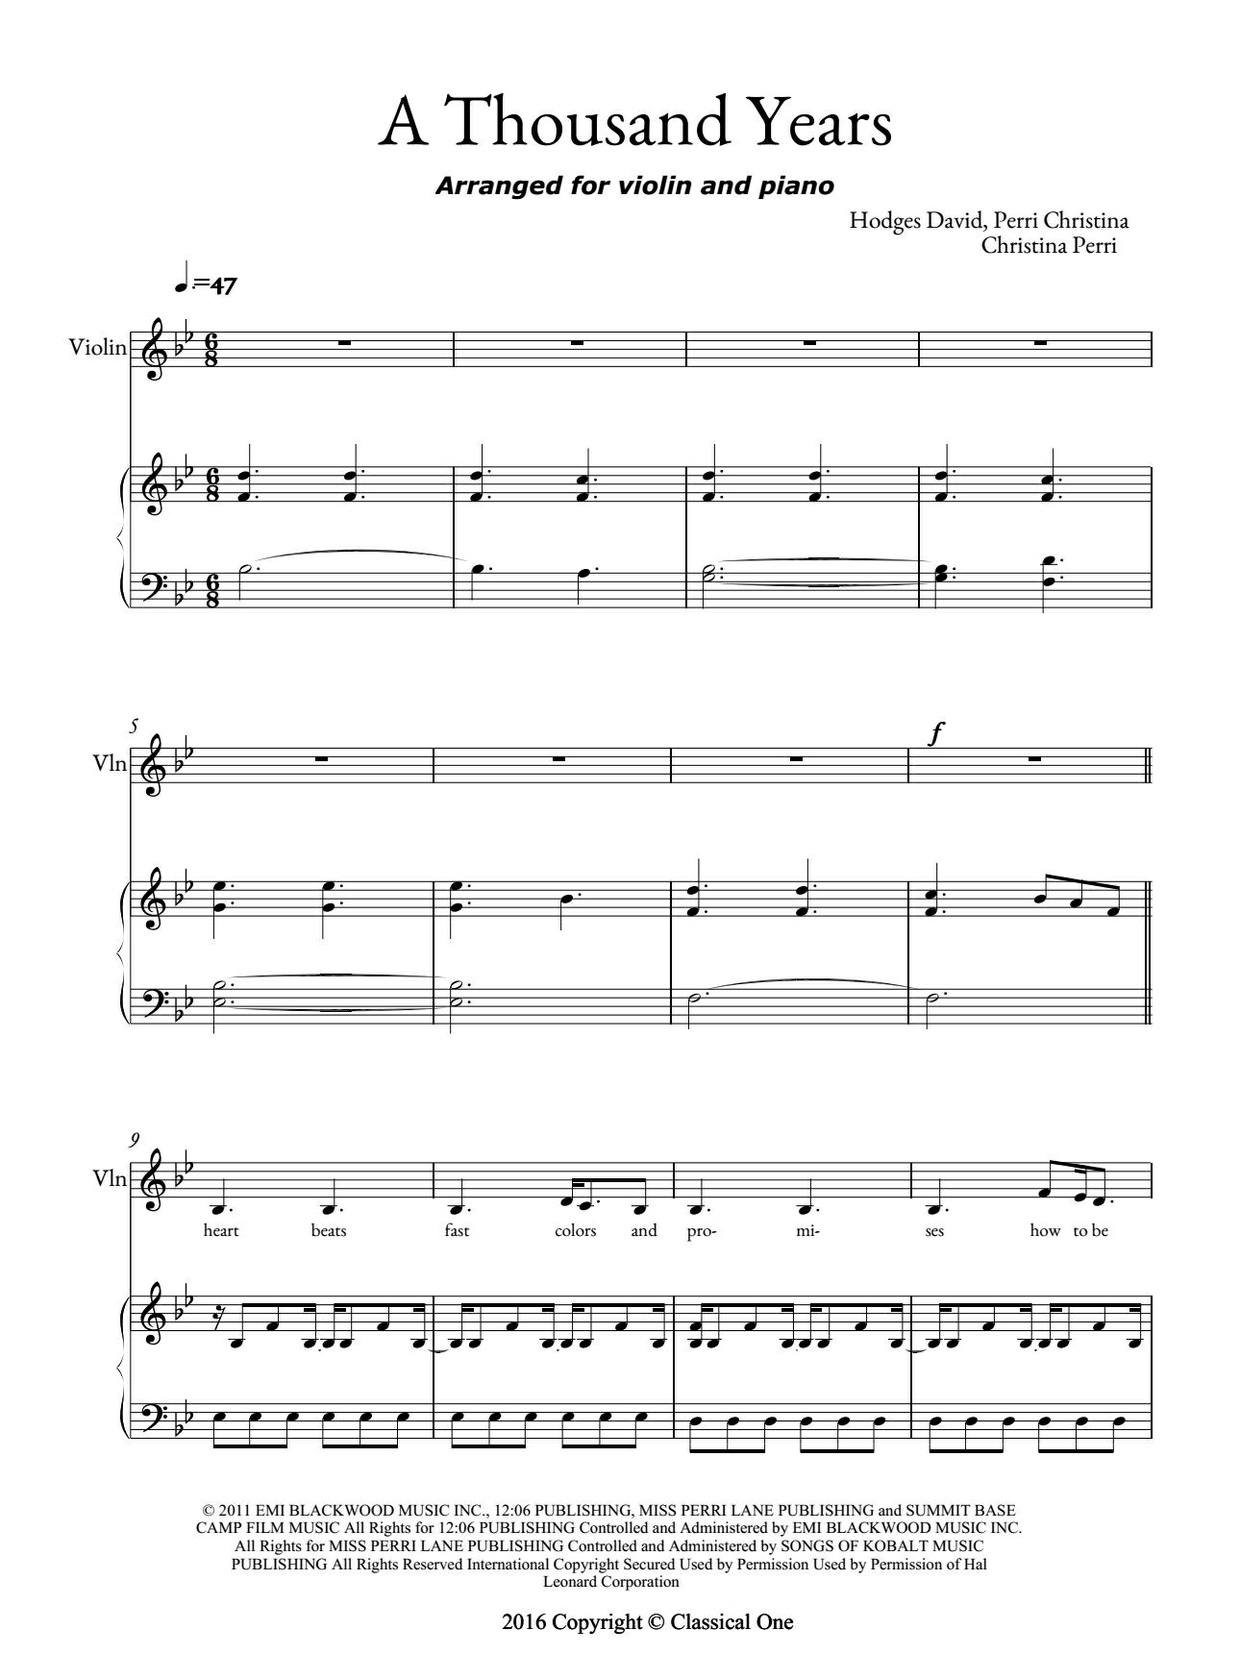 A thousand years sheet music